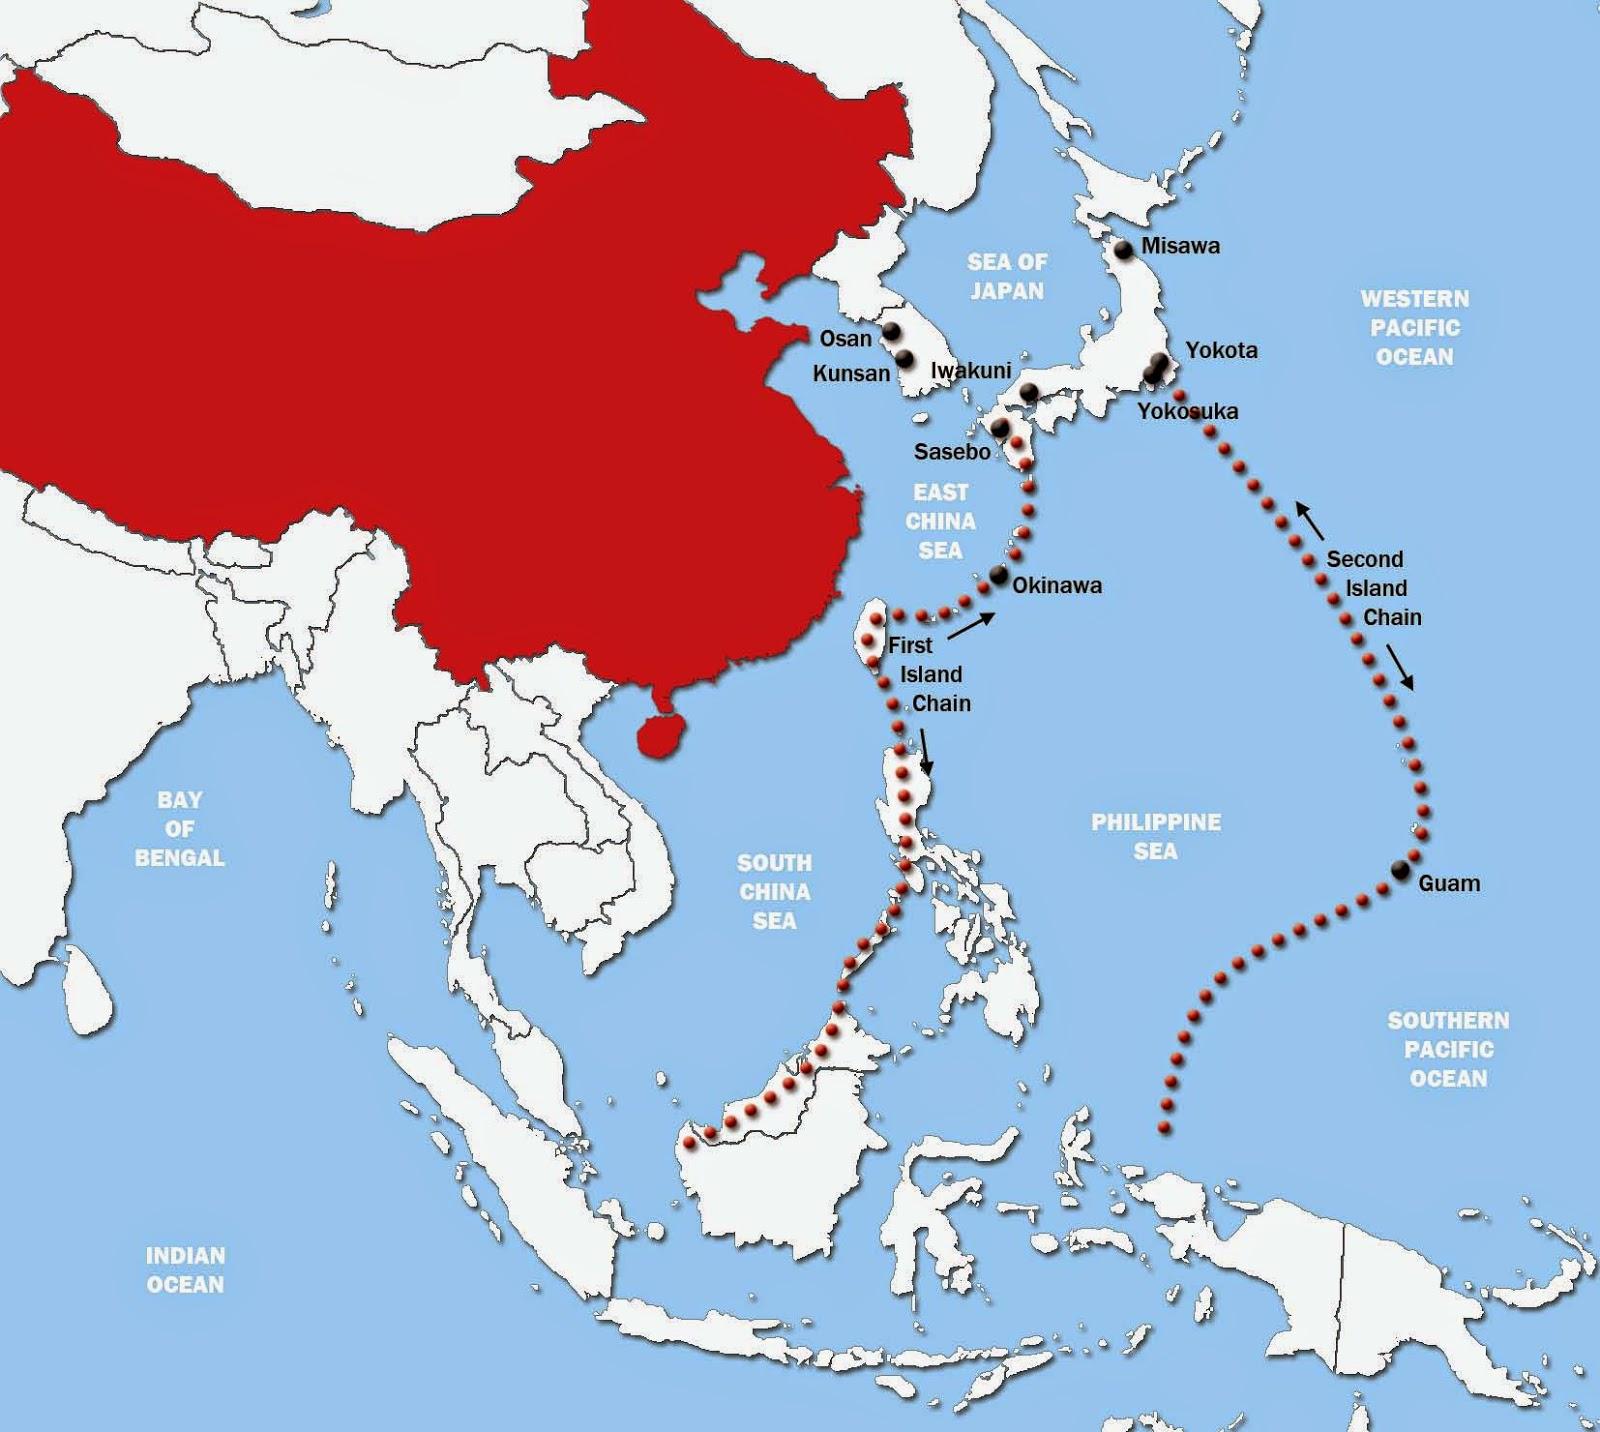 Submarine Matters: Possible Japanese Submarine Deployment Area